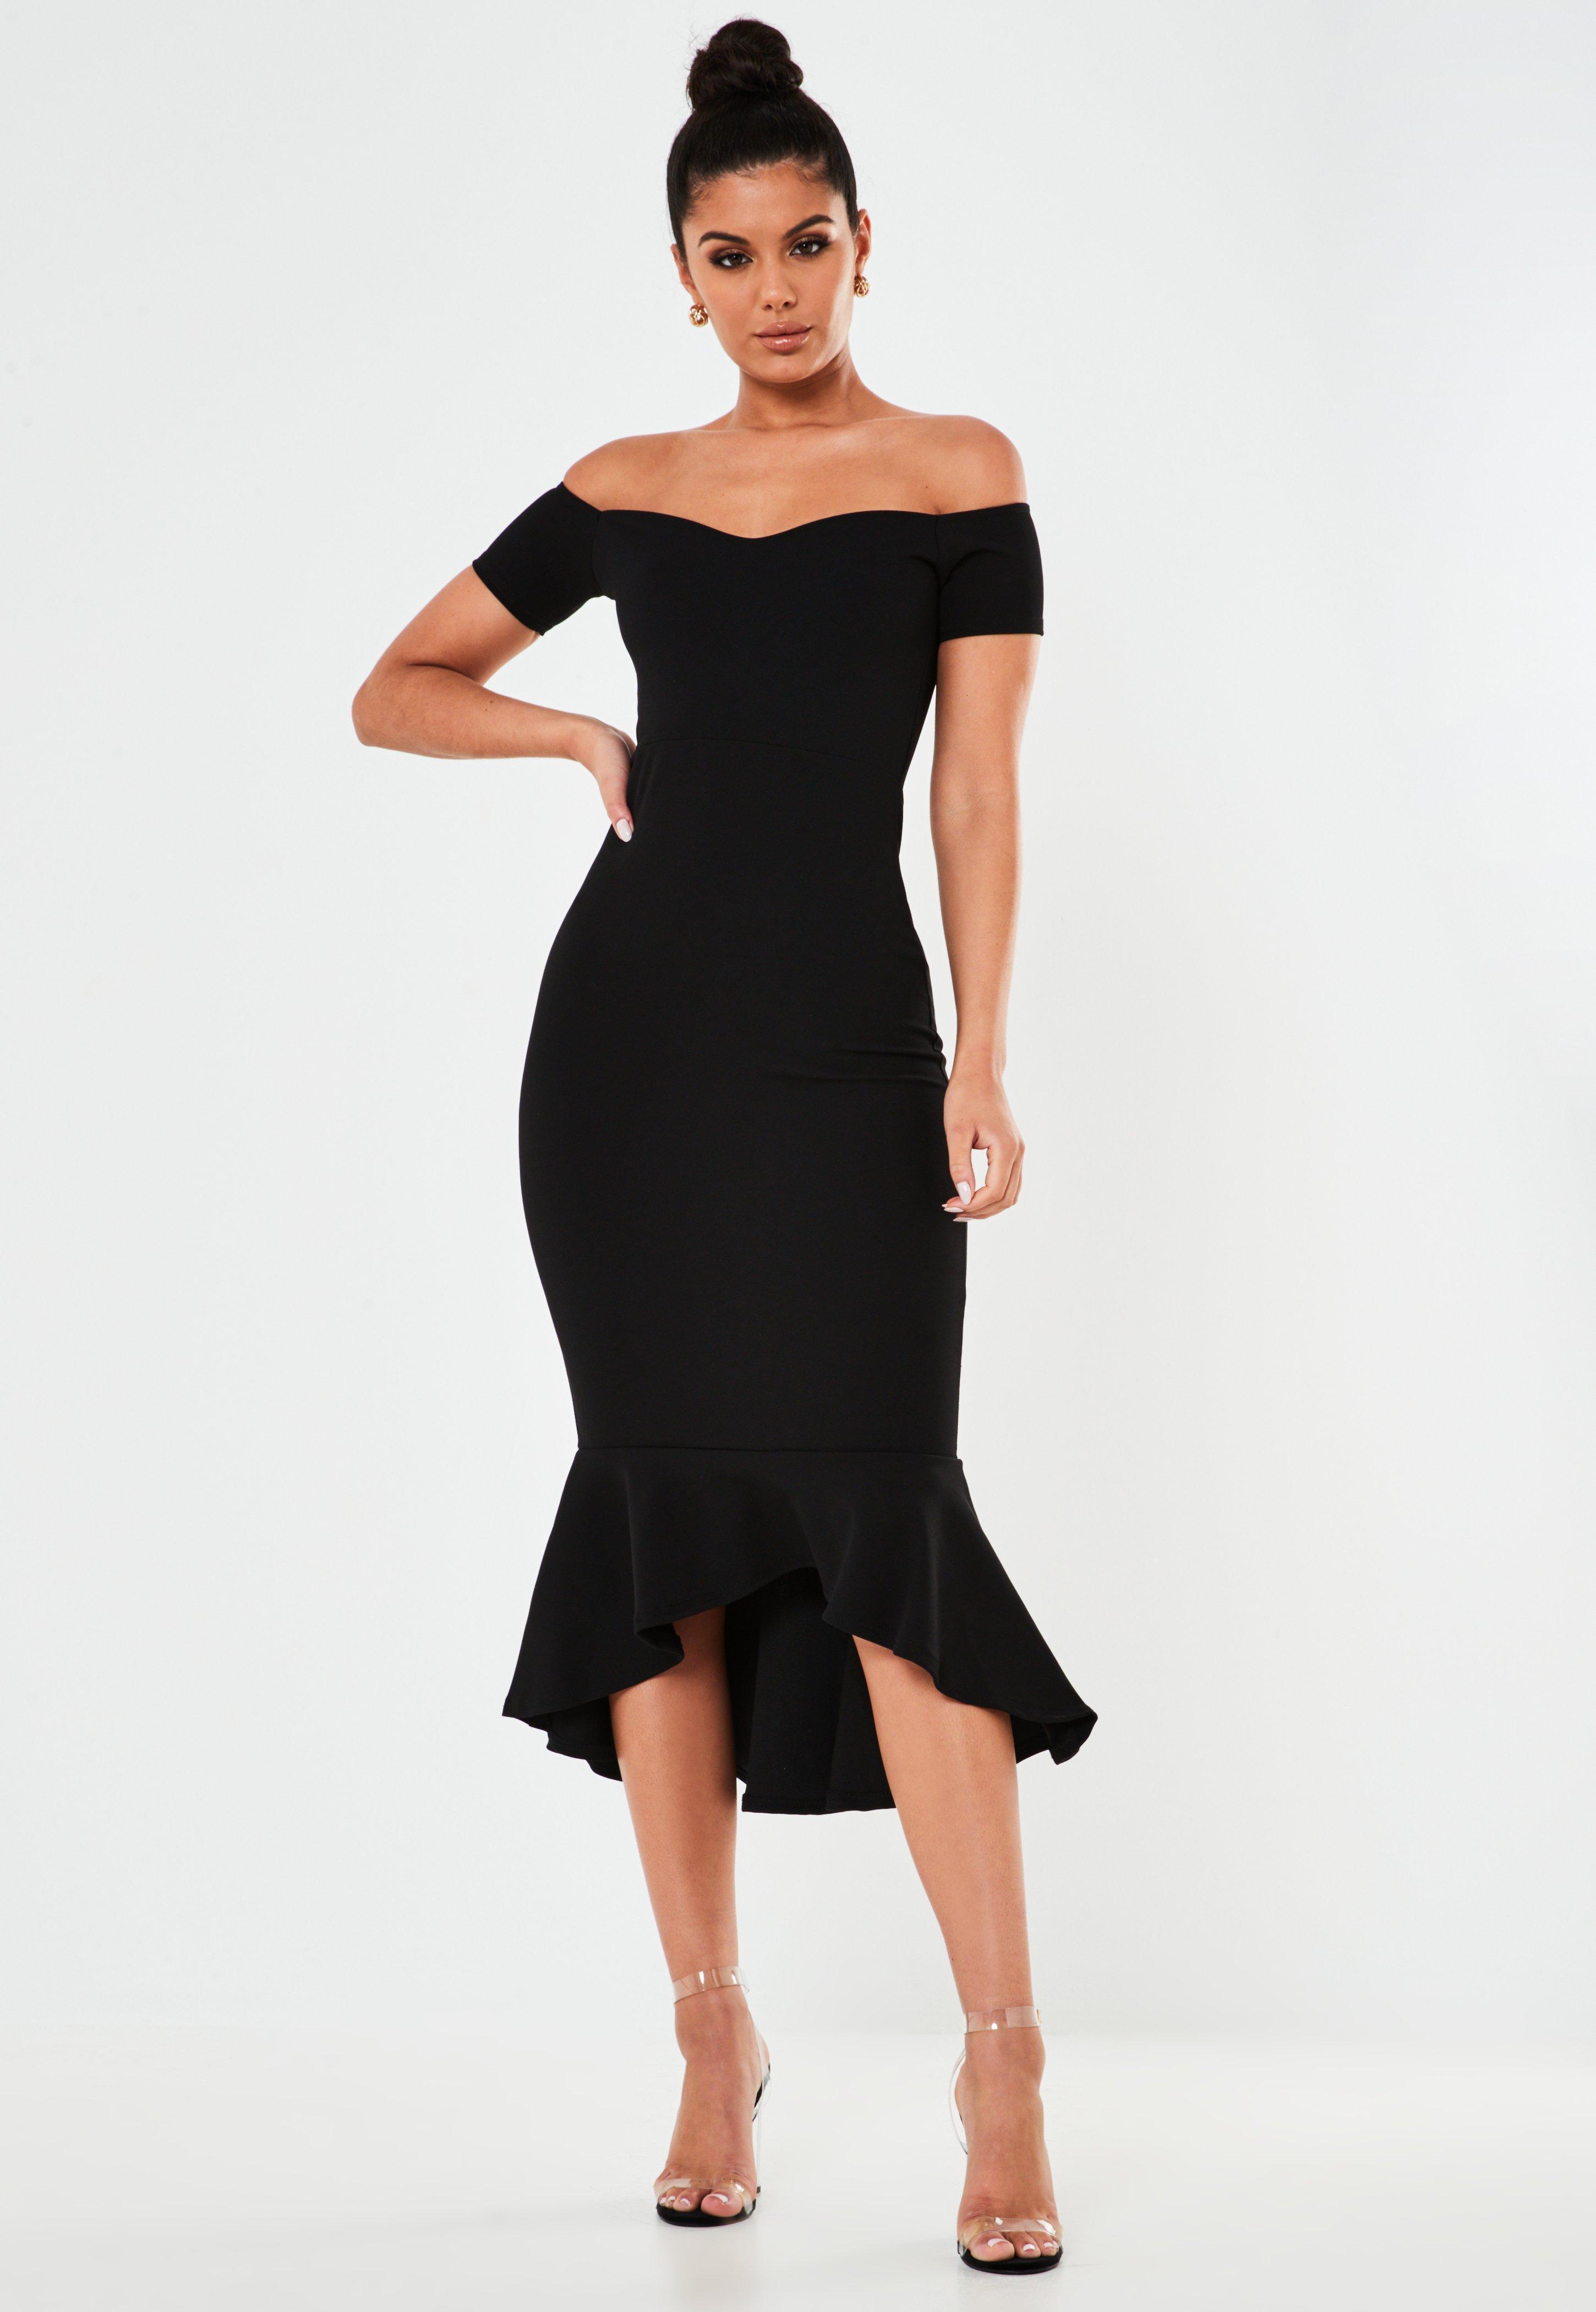 petite cocktail dresses